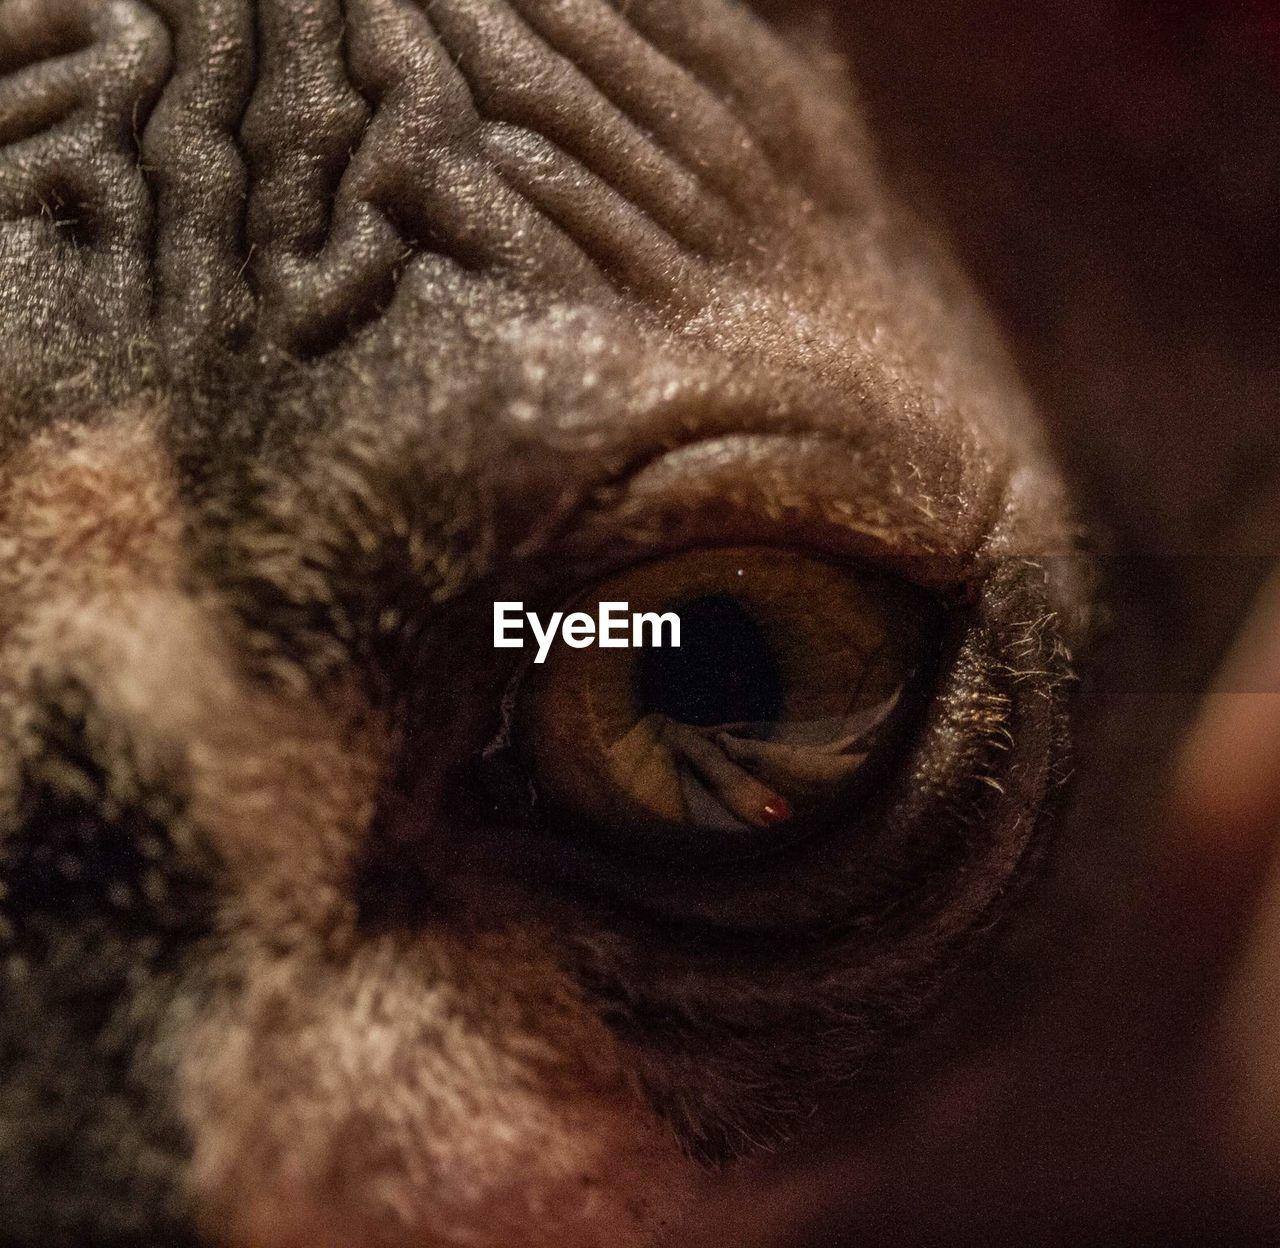 one animal, animal themes, pets, animal body part, mammal, domestic animals, animal head, dog, close-up, animal eye, indoors, no people, nature, day, eyeball